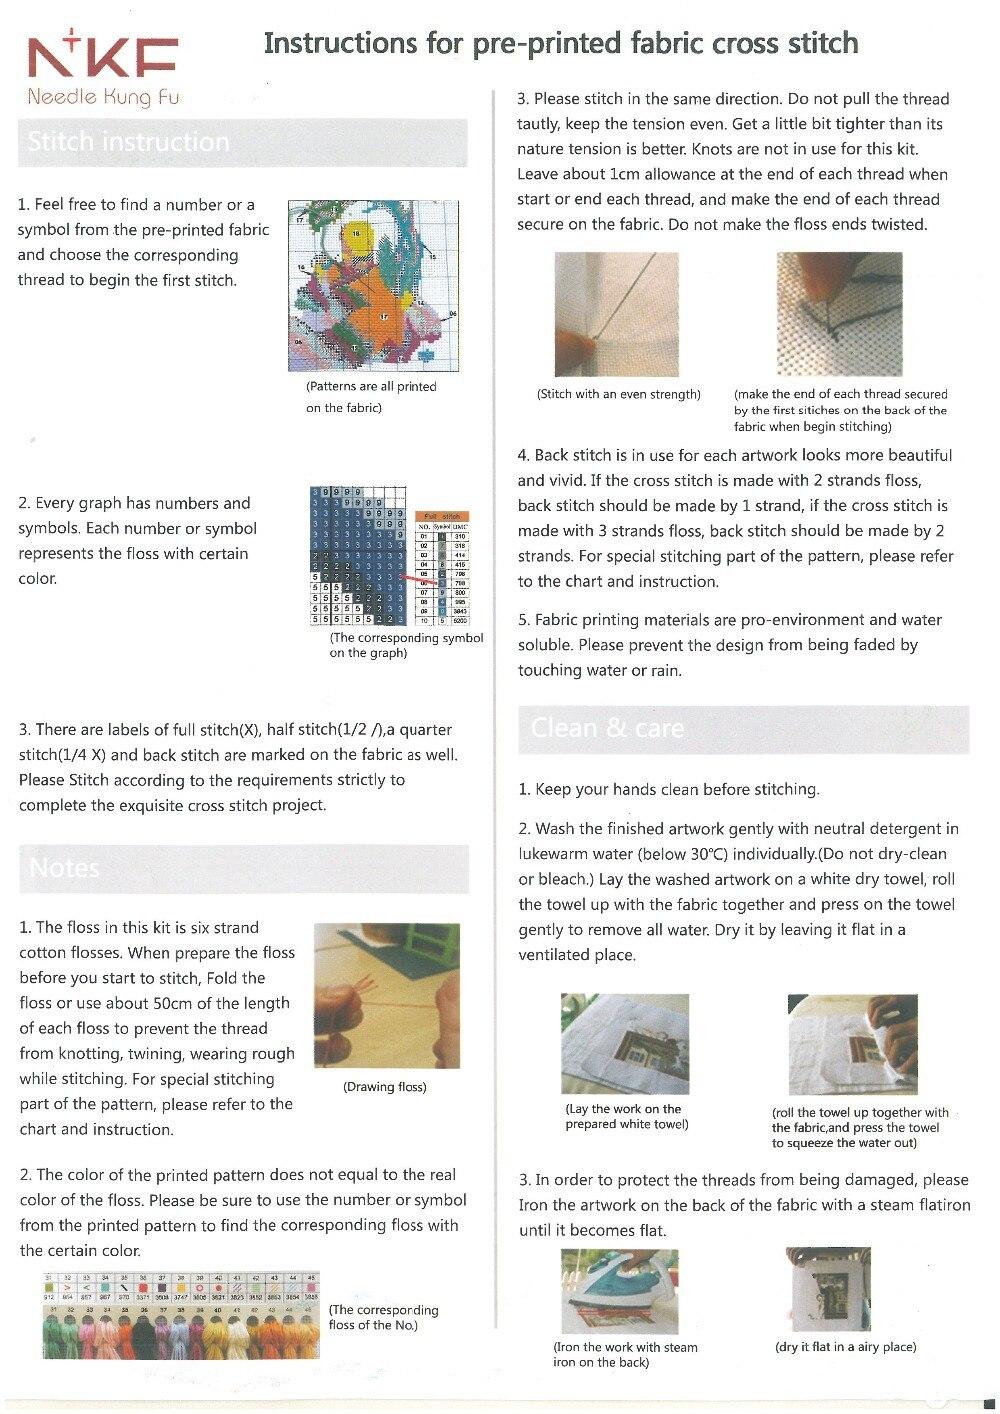 Aliexpress : Buy A Sleep Angel Baby(1)(boy) Cross Stitch Kits 14ct 11ct  Embroidery Sewing Patterns Kit Diy Handmade Needlework Decoration Nkf From